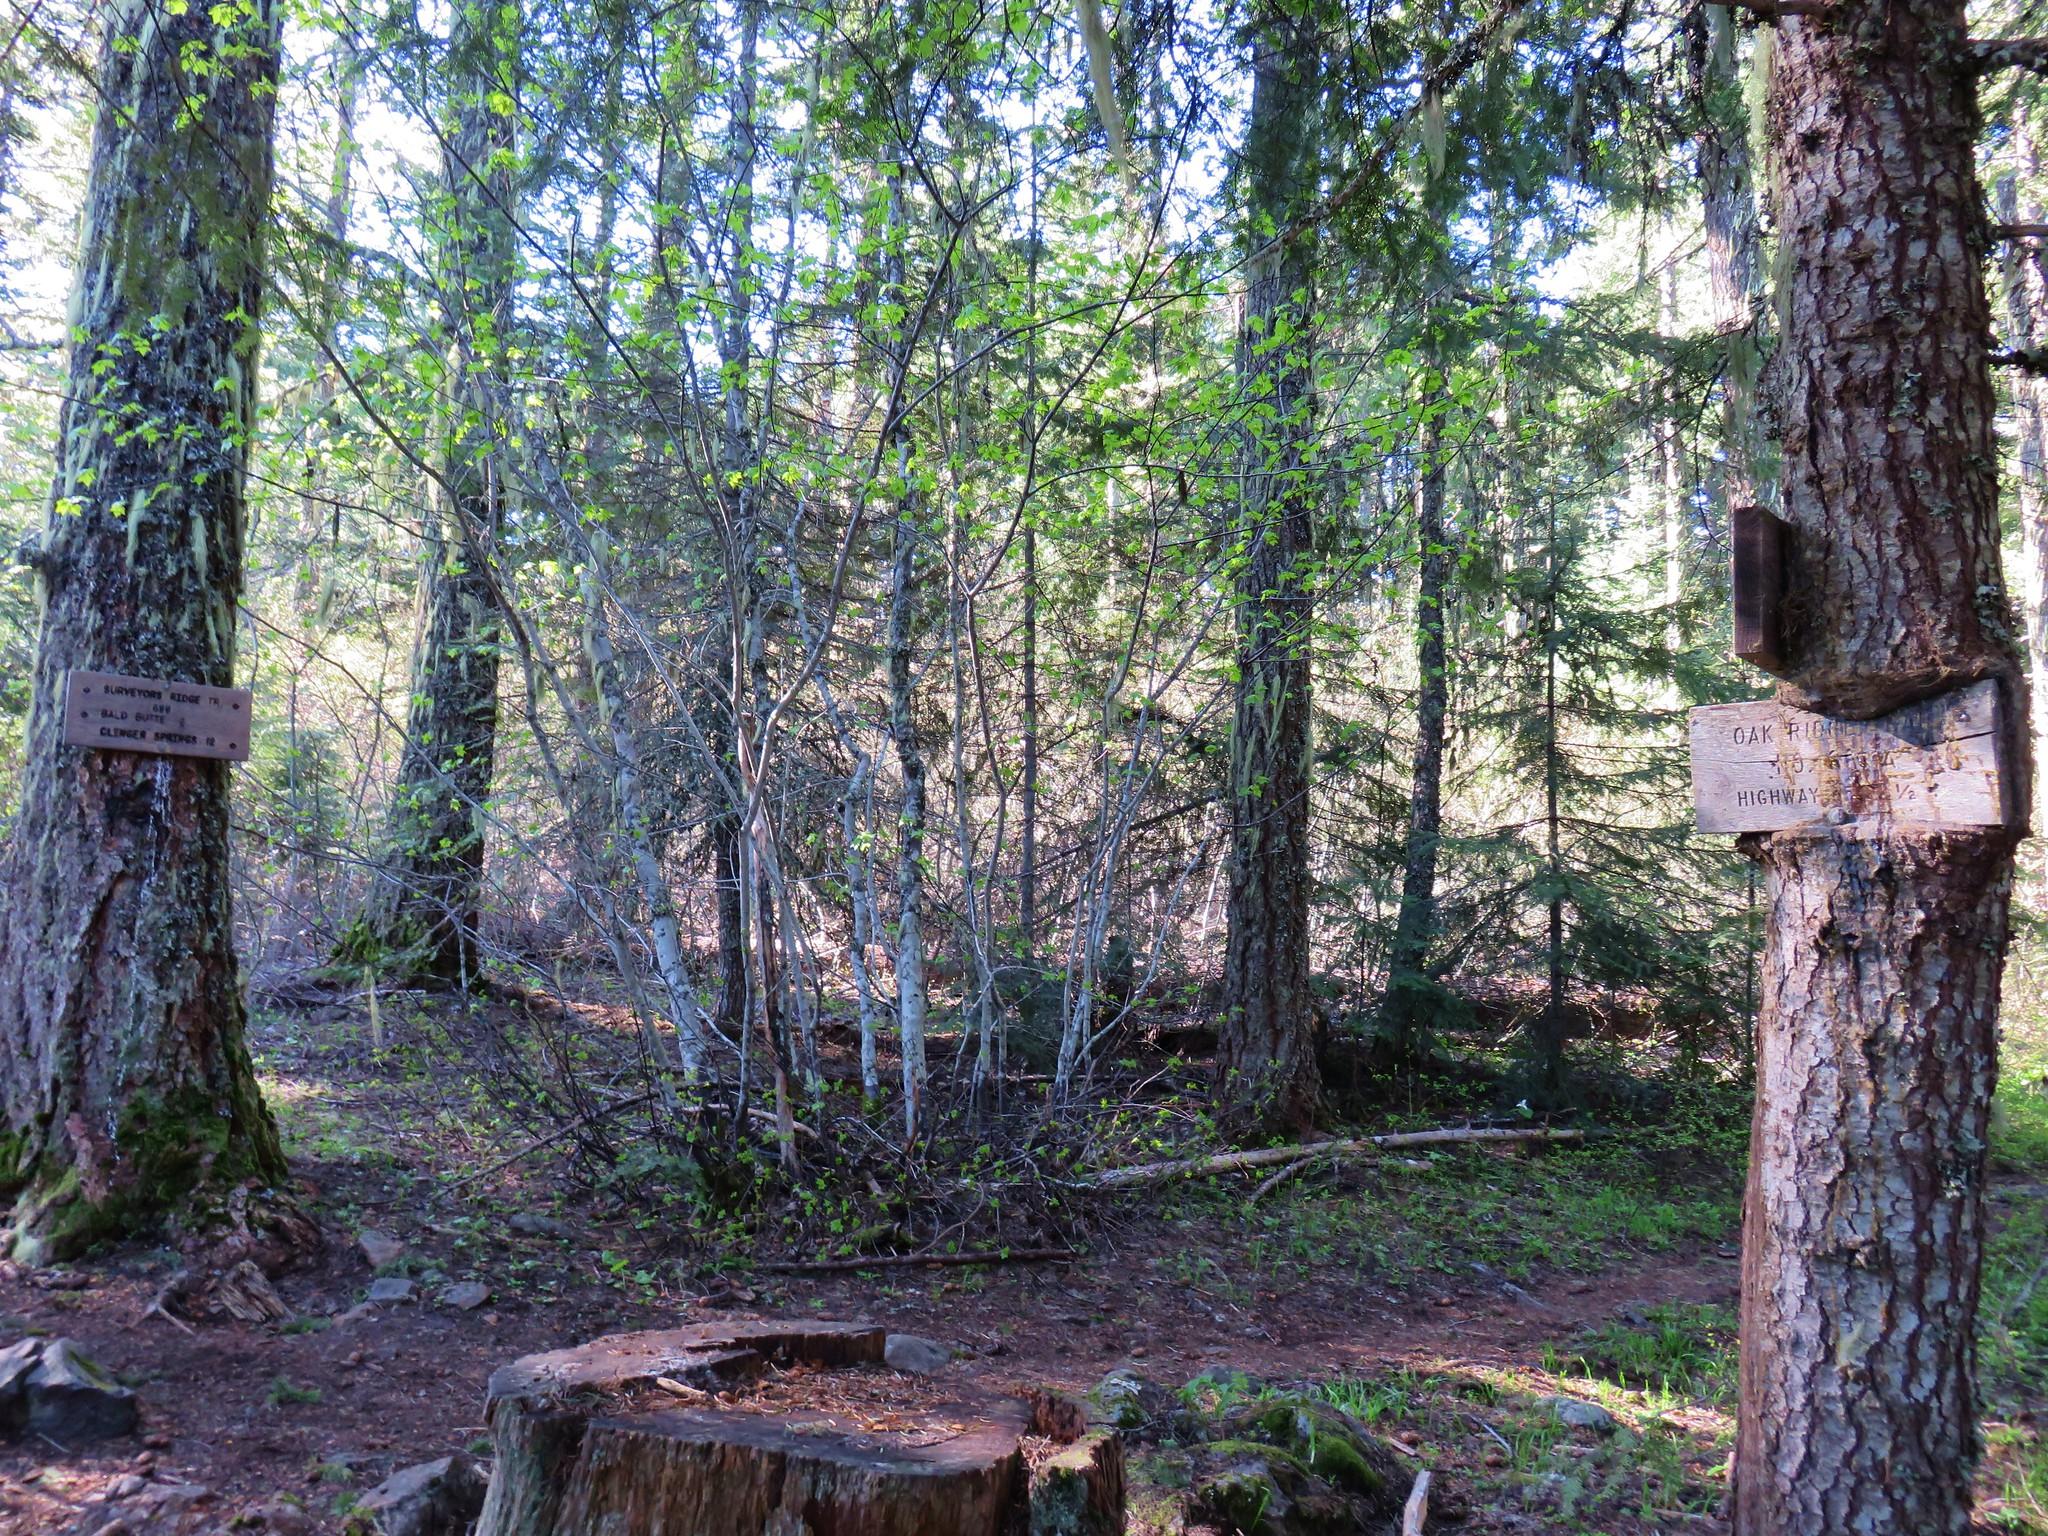 Oak Ridge Trail and Surveryor's Ridge Trail junction